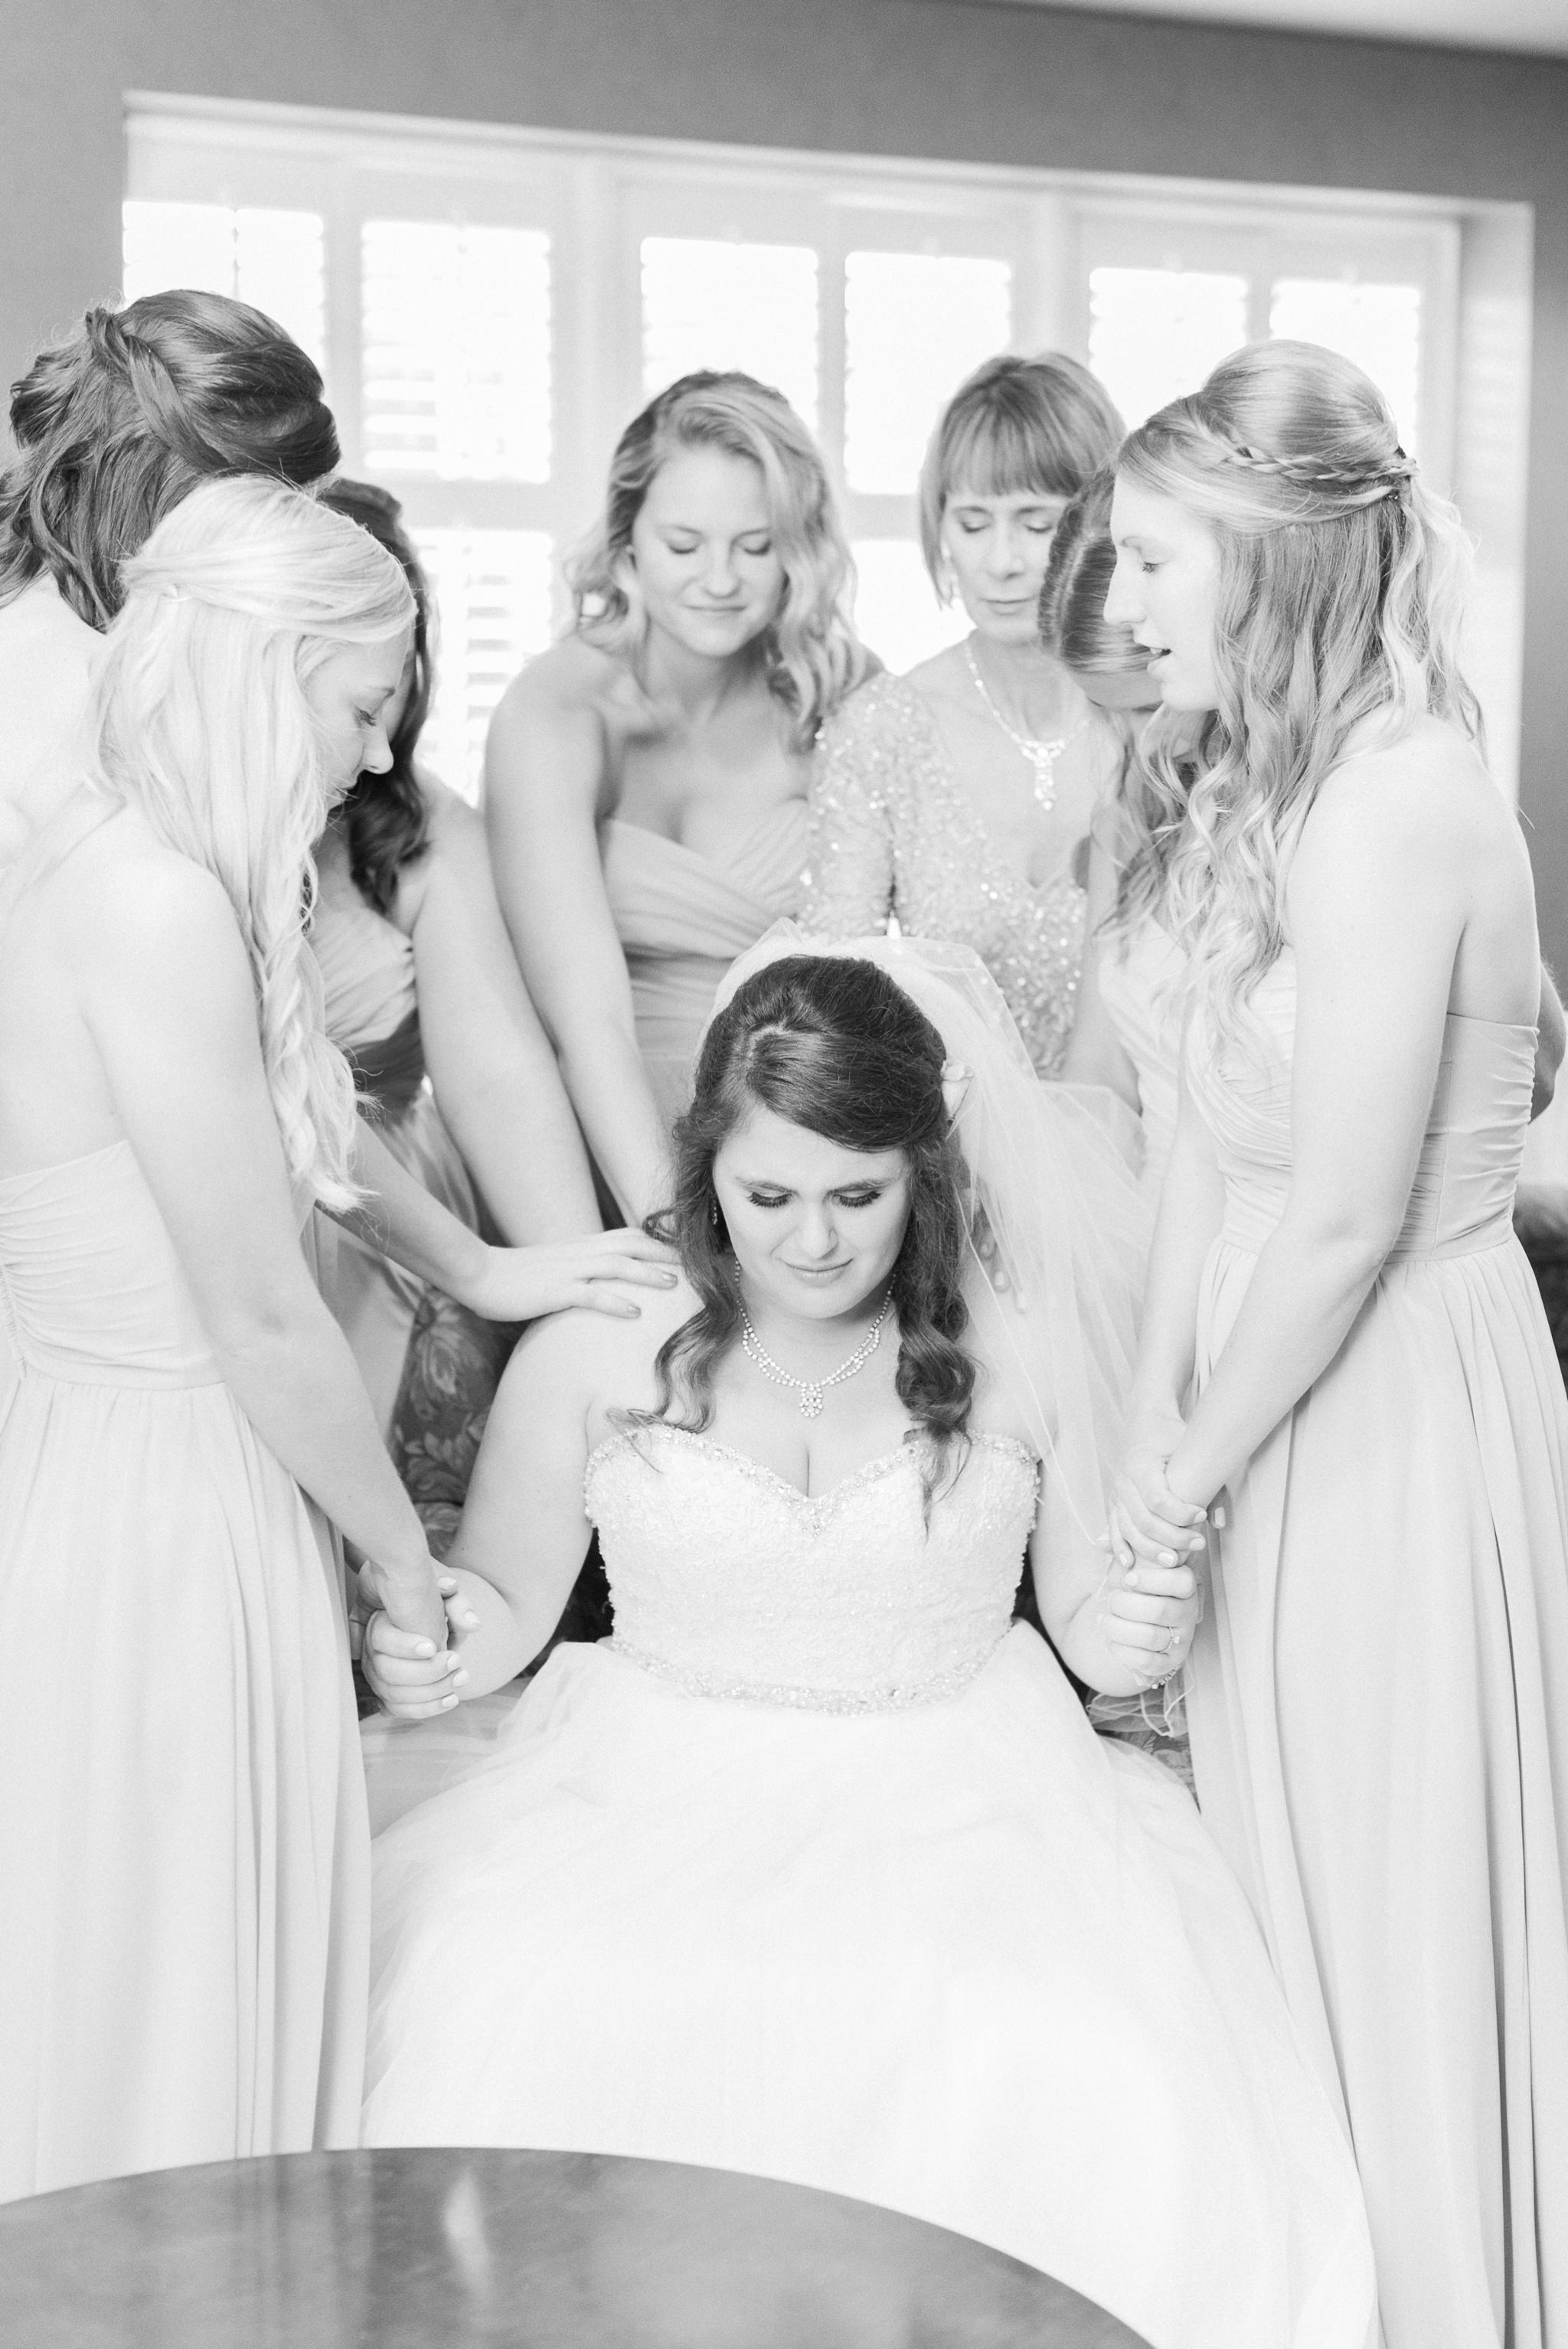 worthington-hills-country-club-wedding-columbus-ohio-meg-evan_0046.jpg